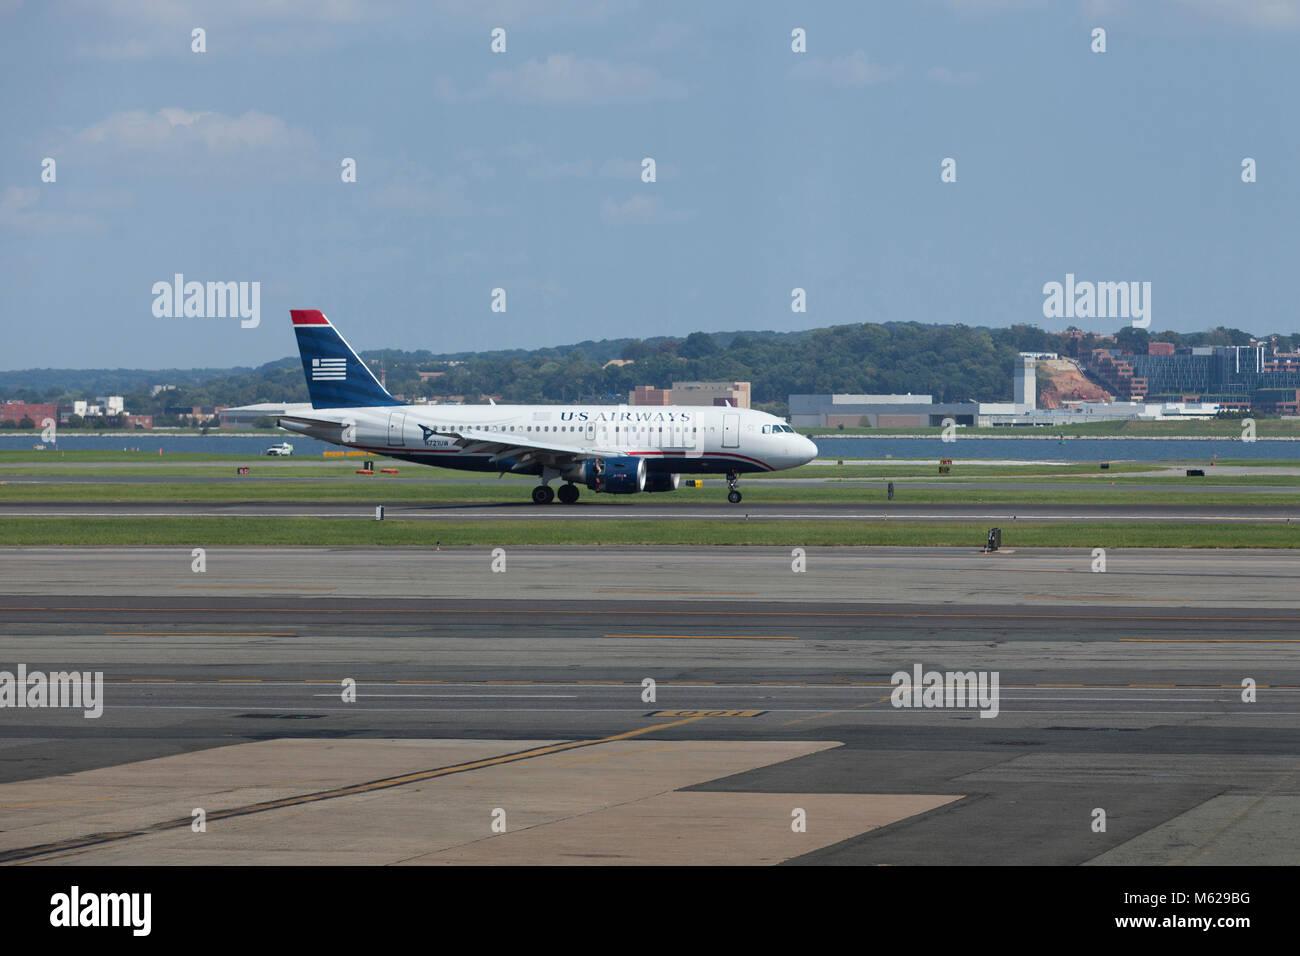 US Airways passenger jet (Airbus A319-100) taxiing at Ronald Reagan National Airport - Washington, DC USA - Stock Image